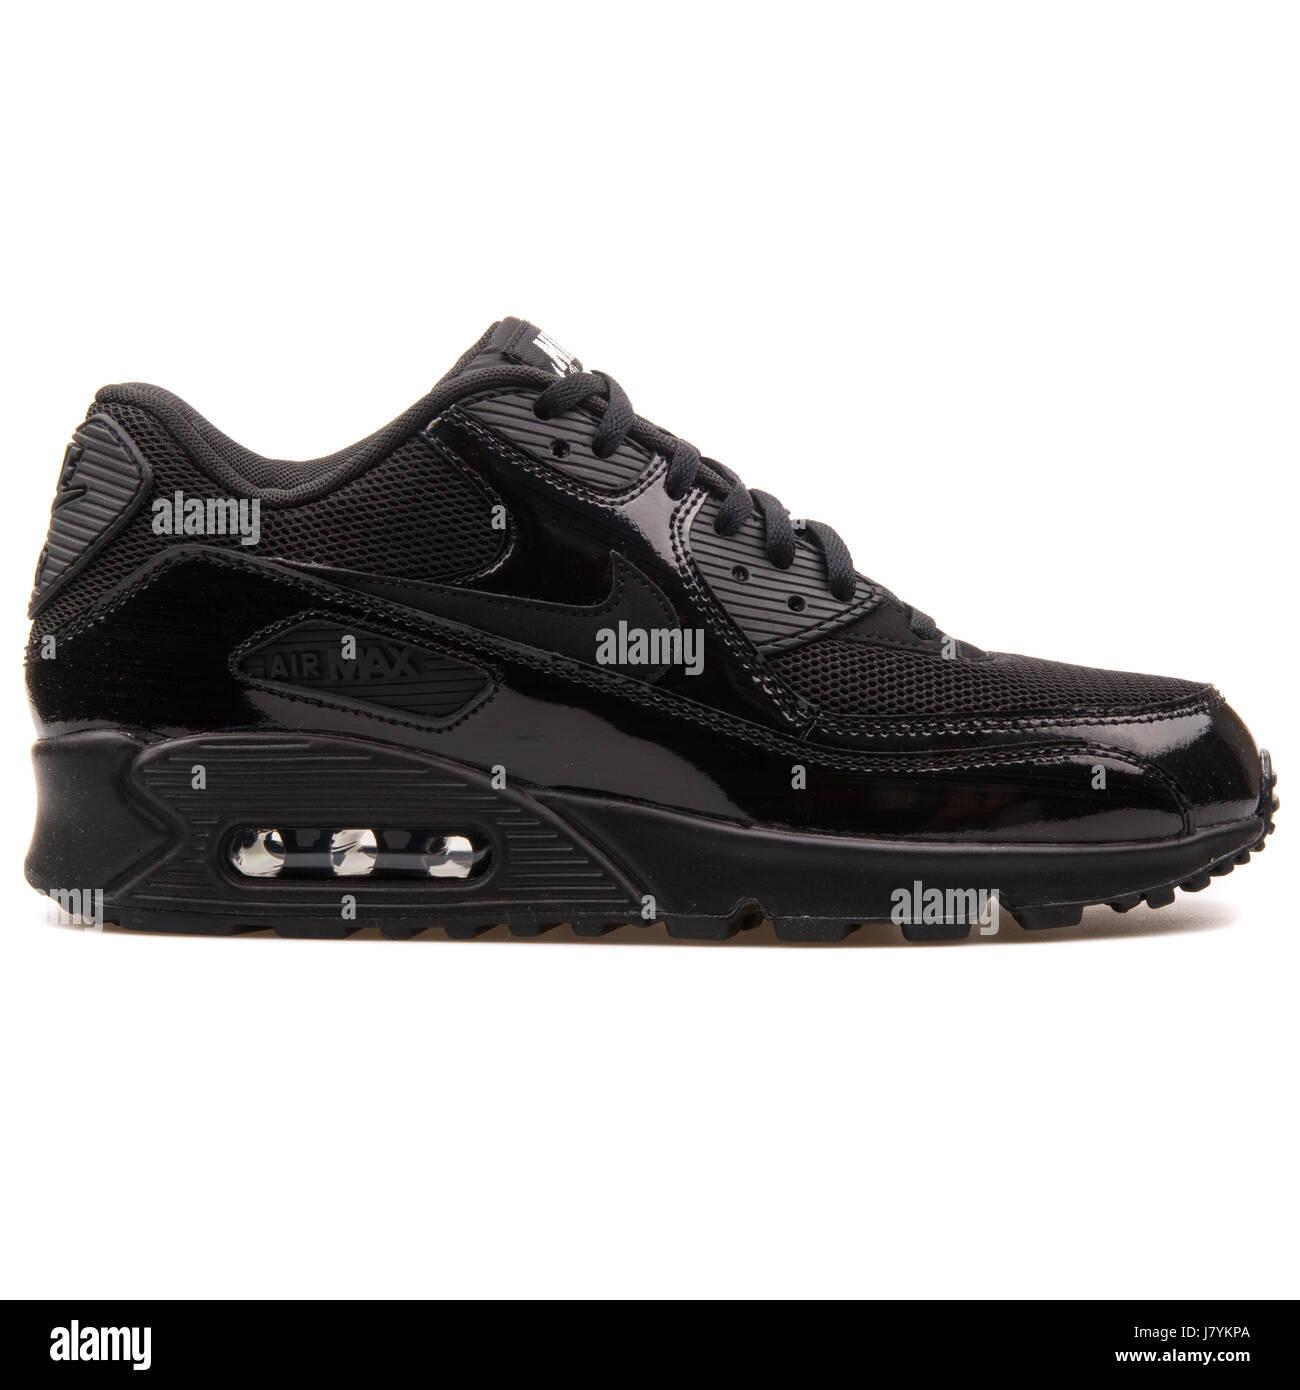 Nike WMNS Air Max 90 Premium Women's Black Glossy Sneakers